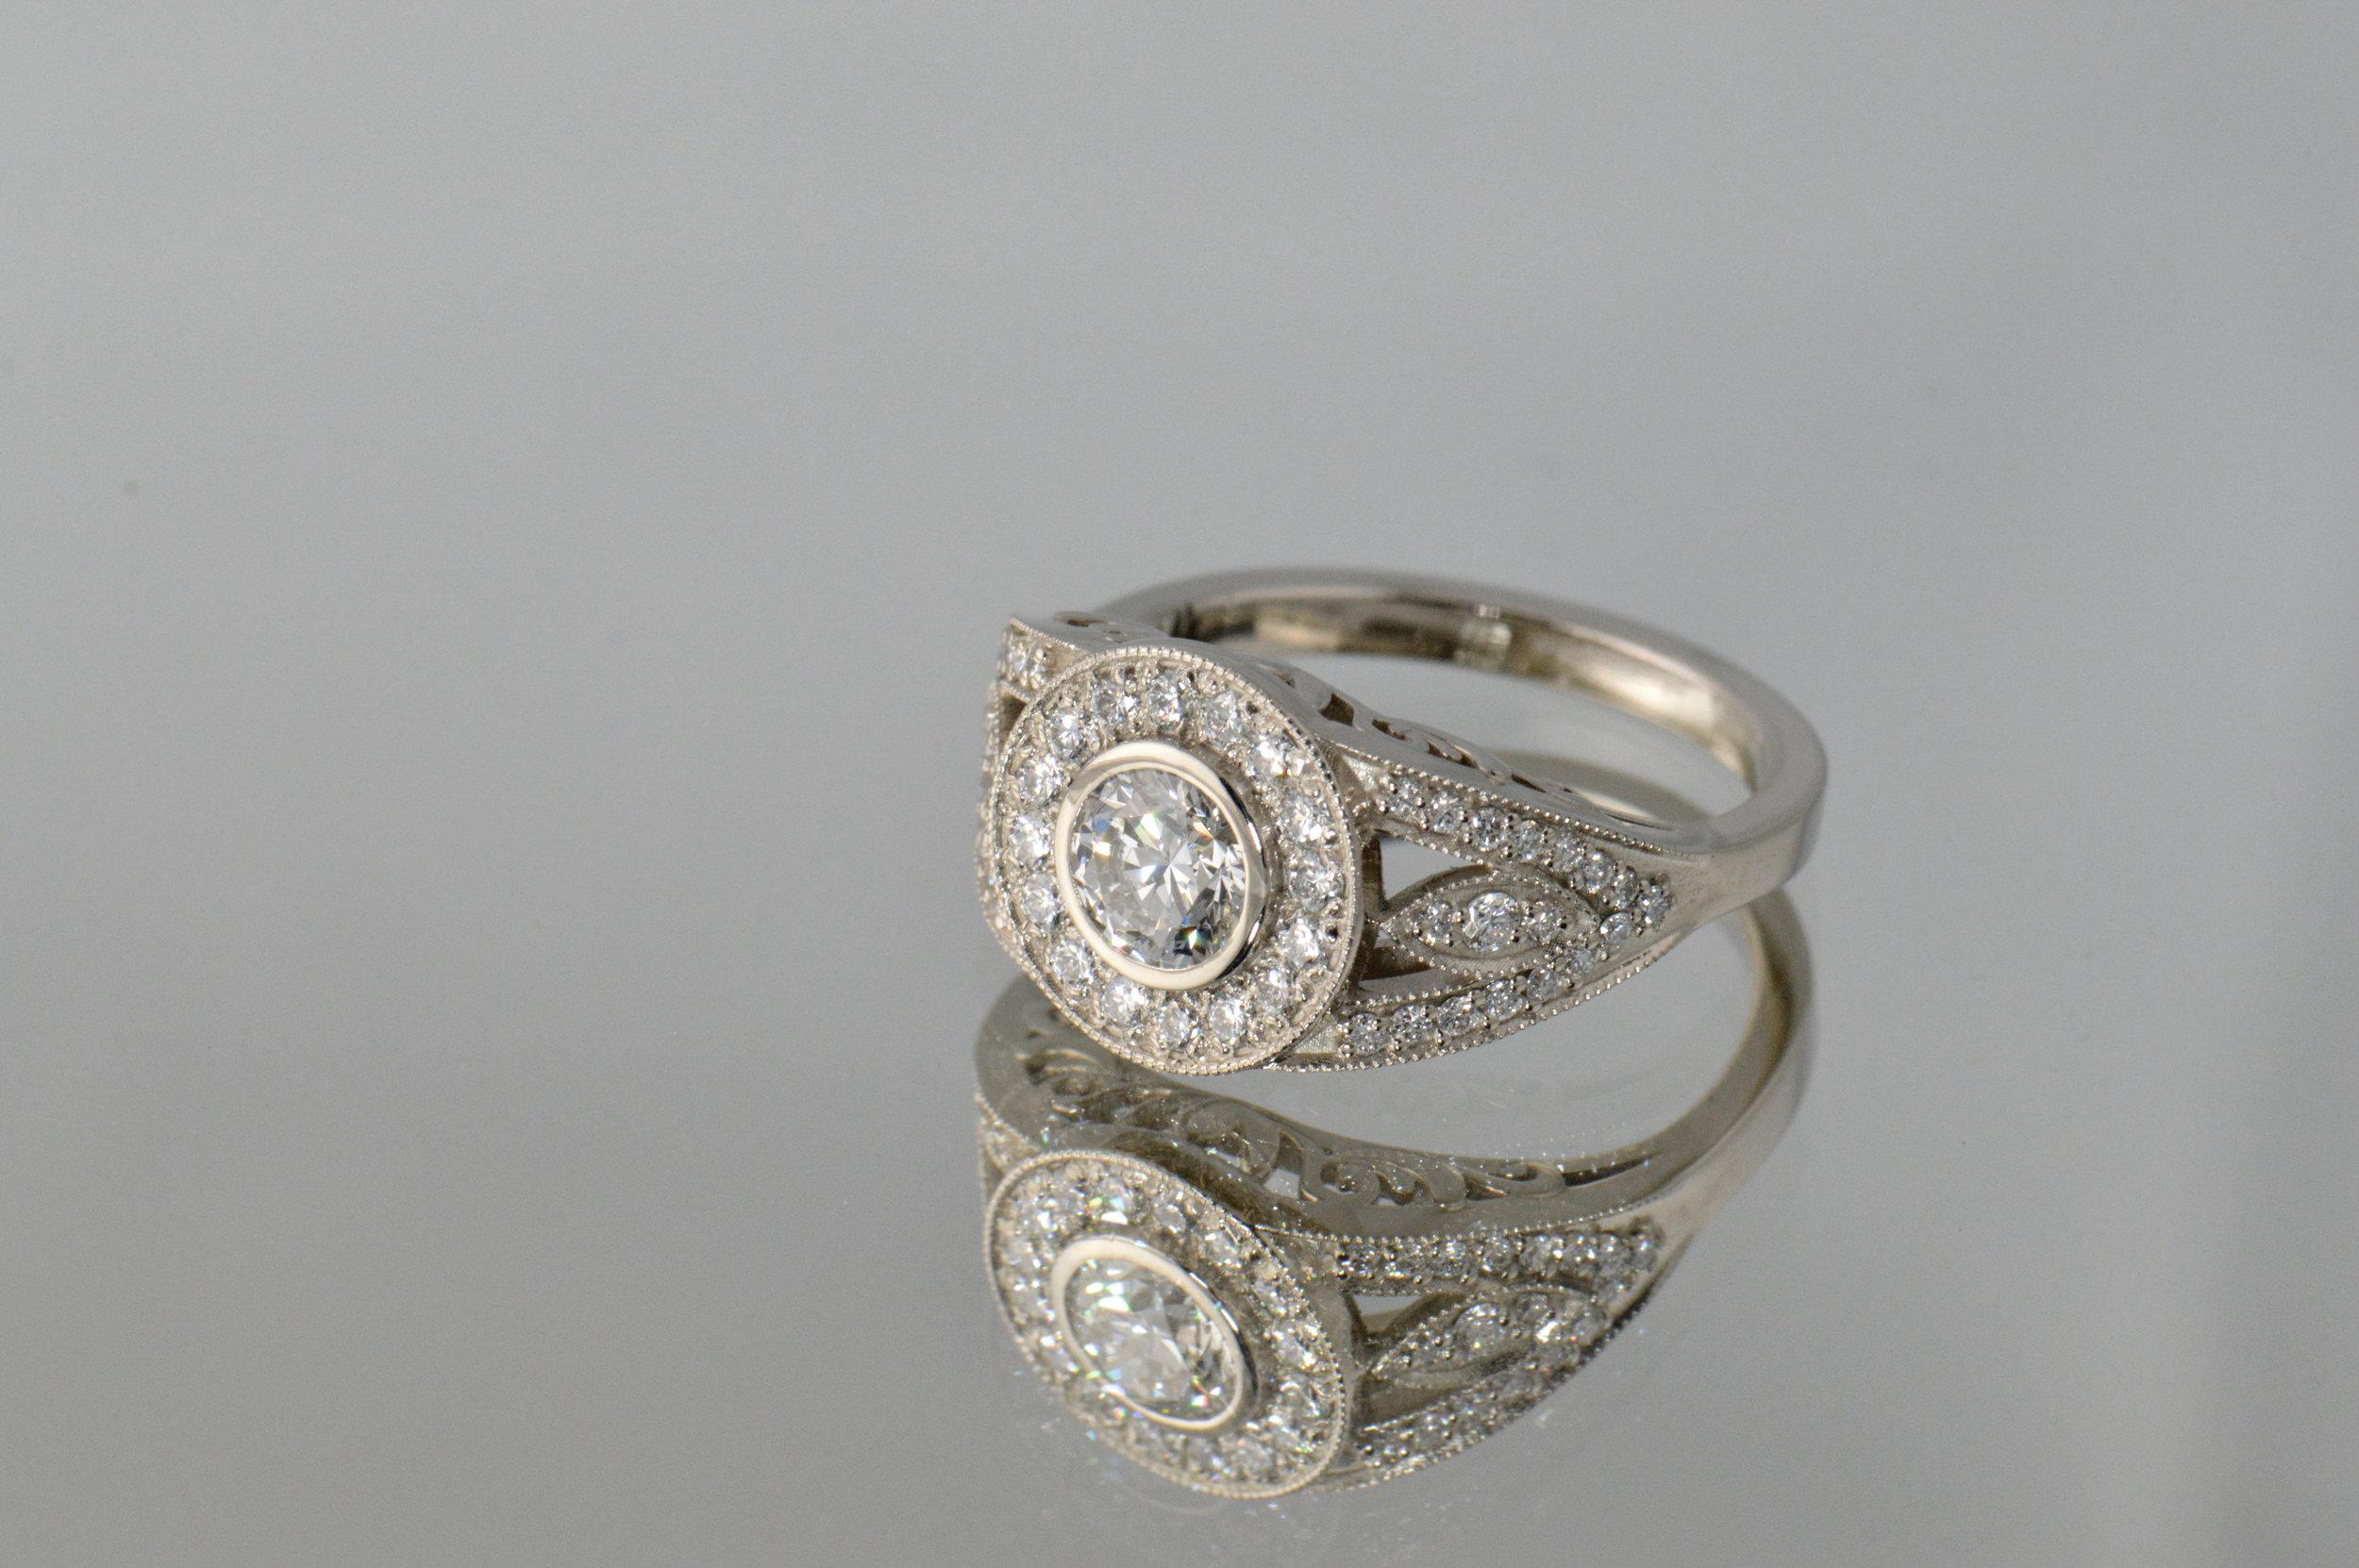 darvier-diamond-vintage-inspired-wedding-ring.JPG